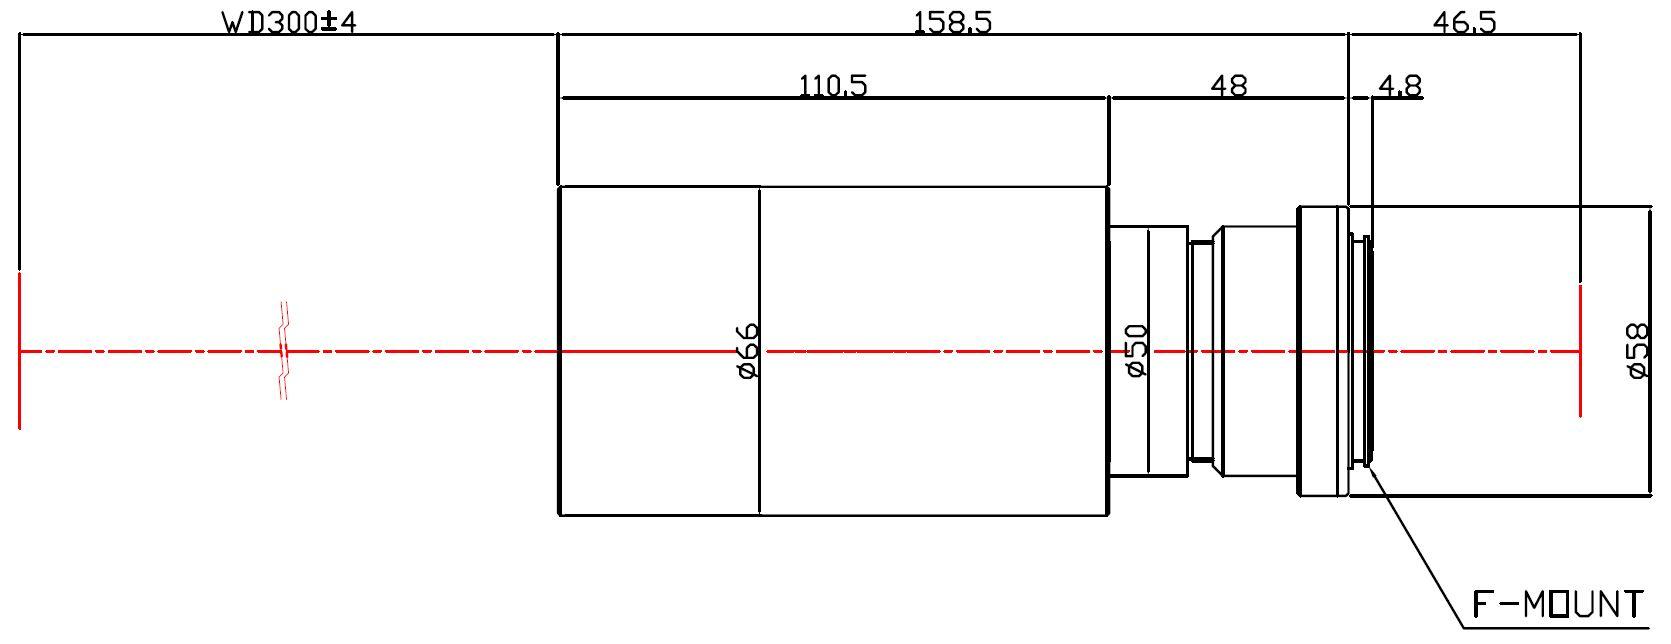 Lensagon MF15M-042-300